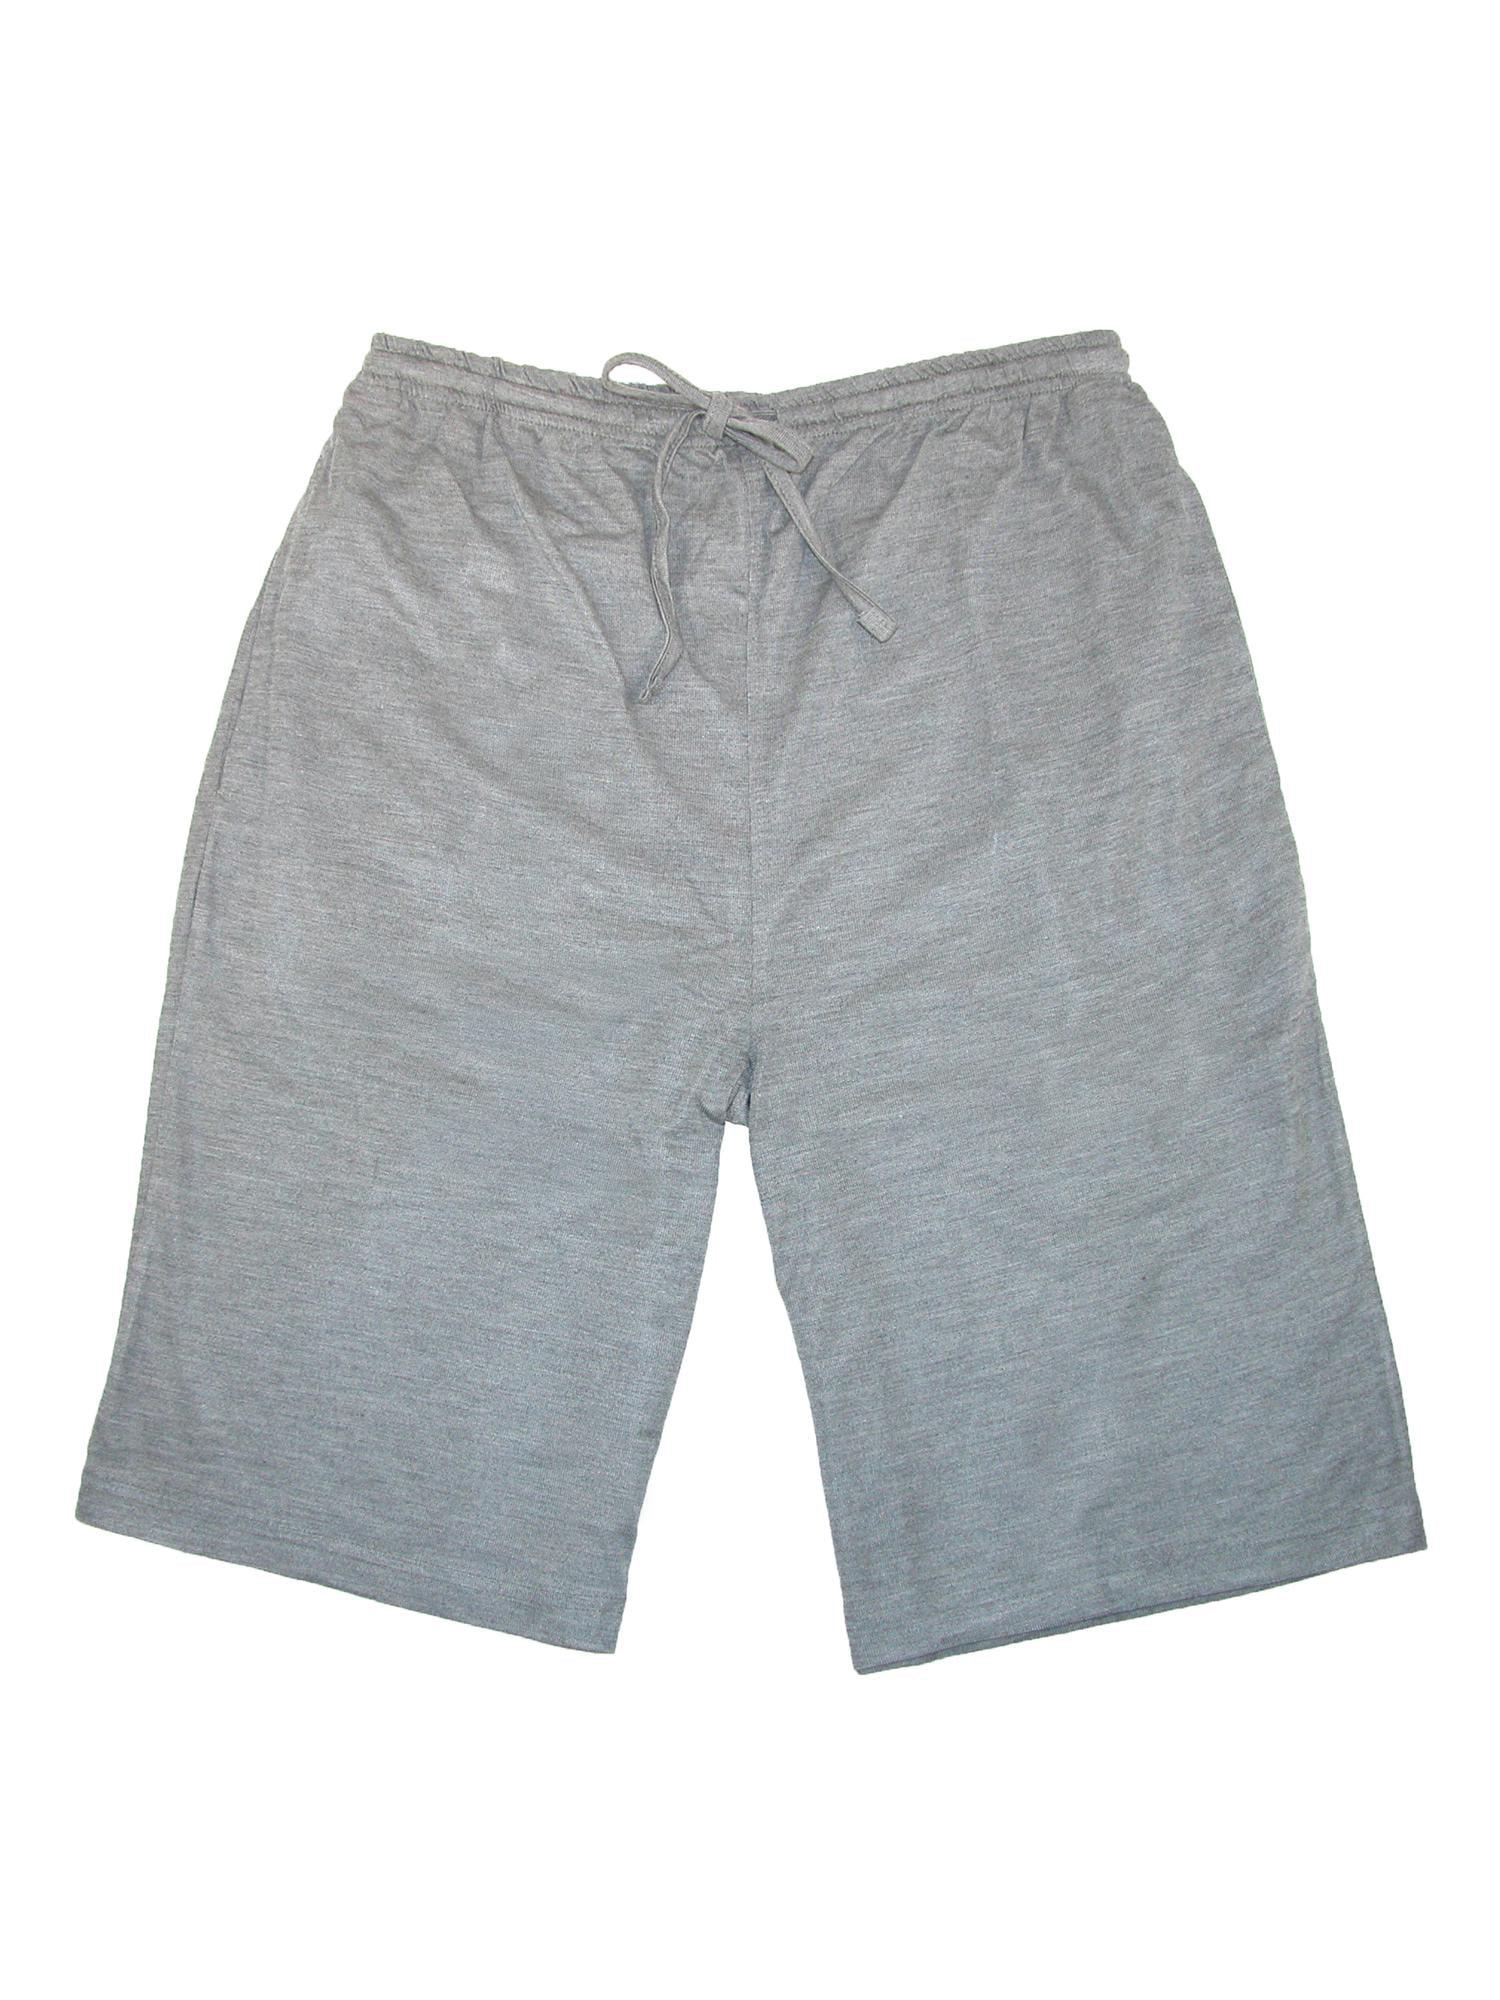 Ten West Apparel Men's Knit Men's Sleep Shorts with Pockets